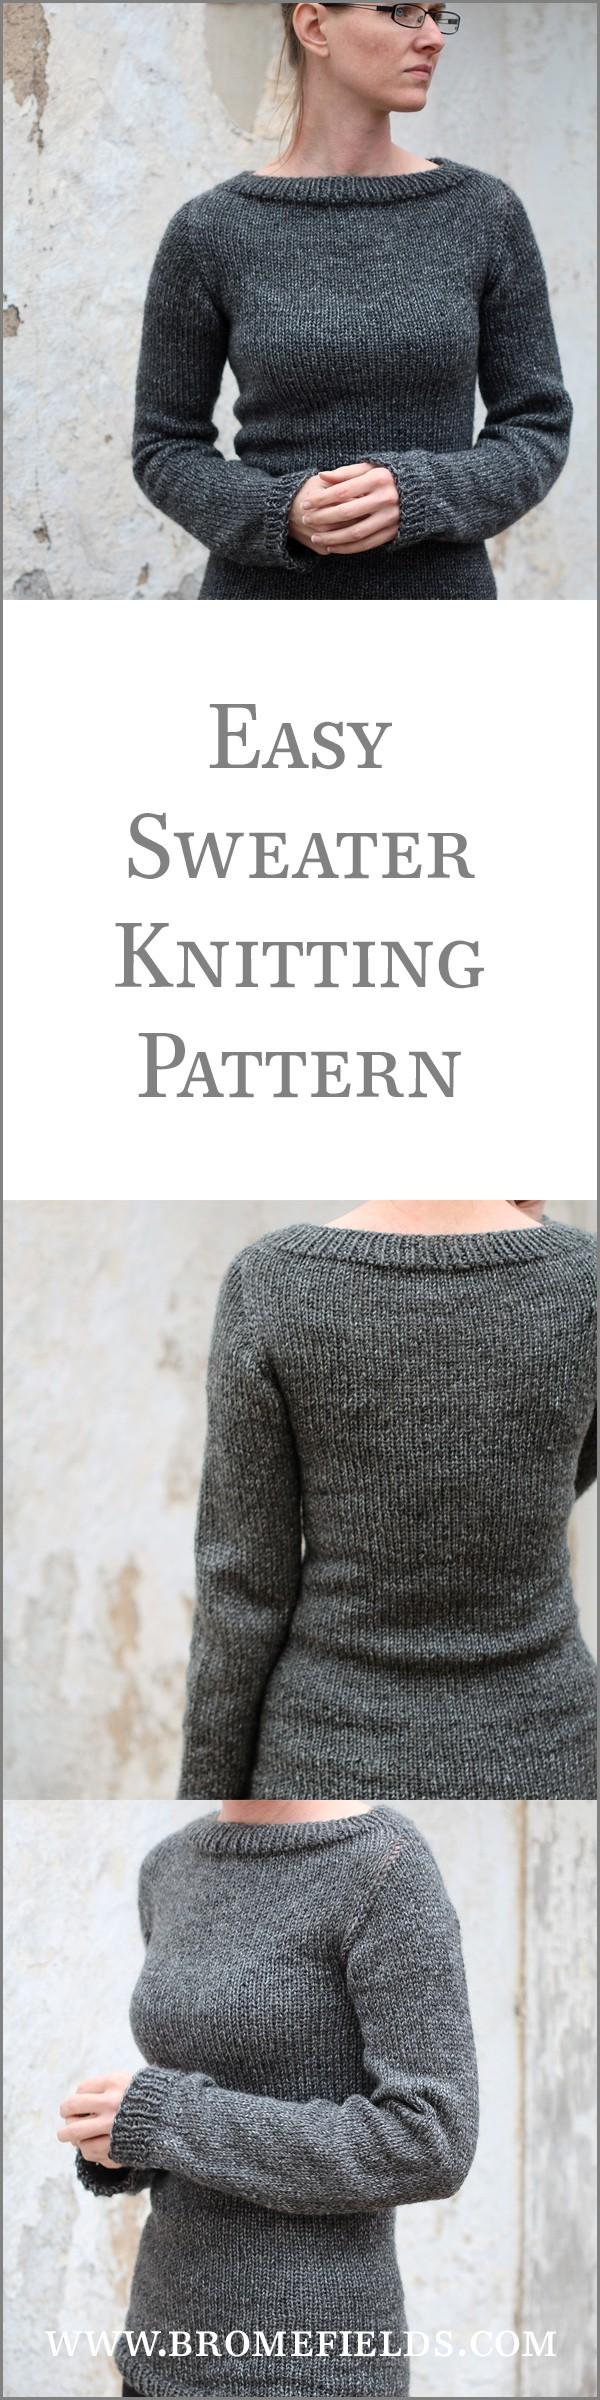 Knitting In The Heartland 2015 : Discipline sweater knitting pattern brome fields